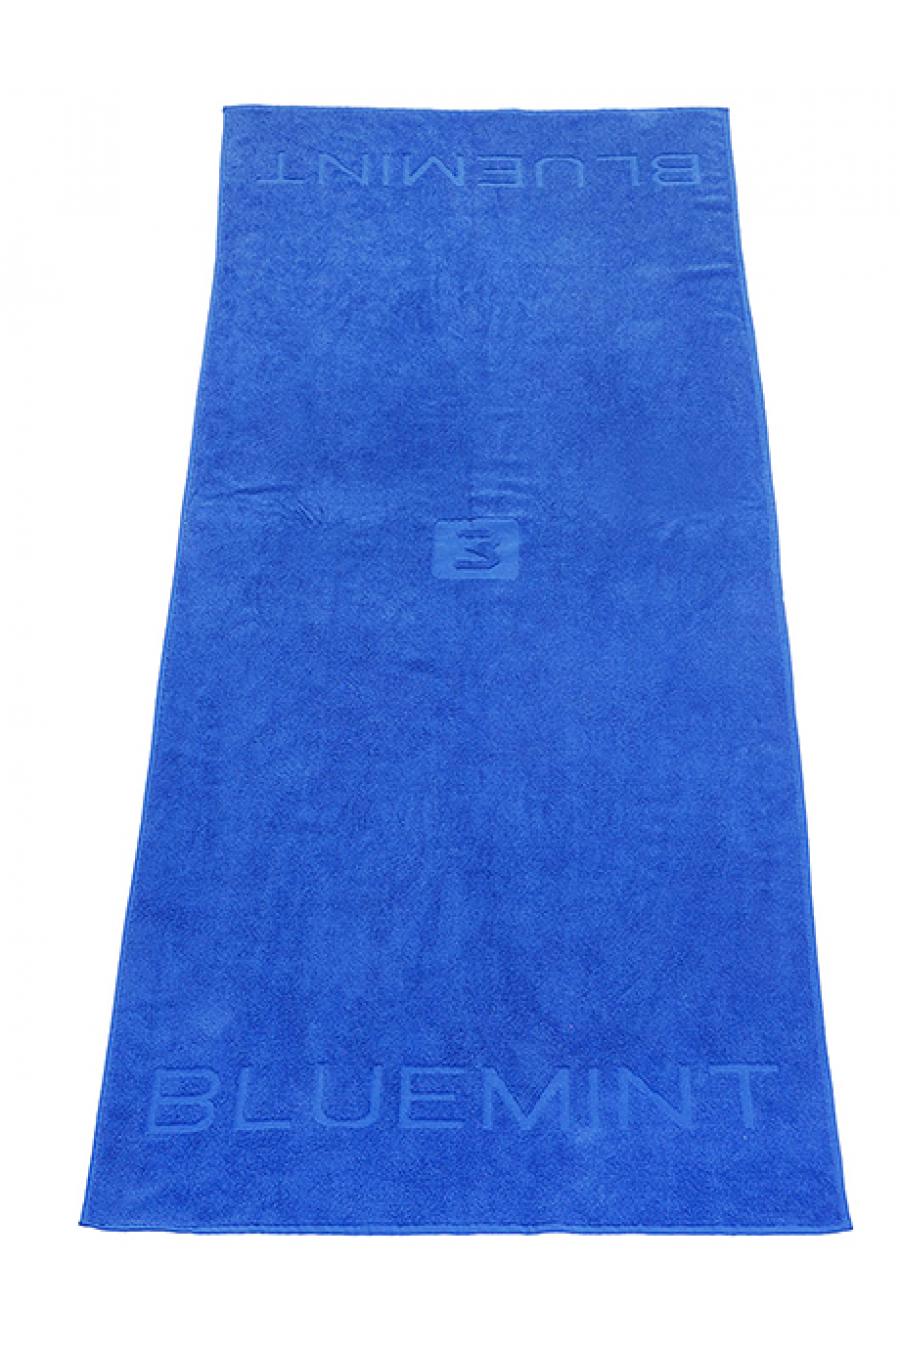 BLUEMINT - Hector Plaj Havlusu